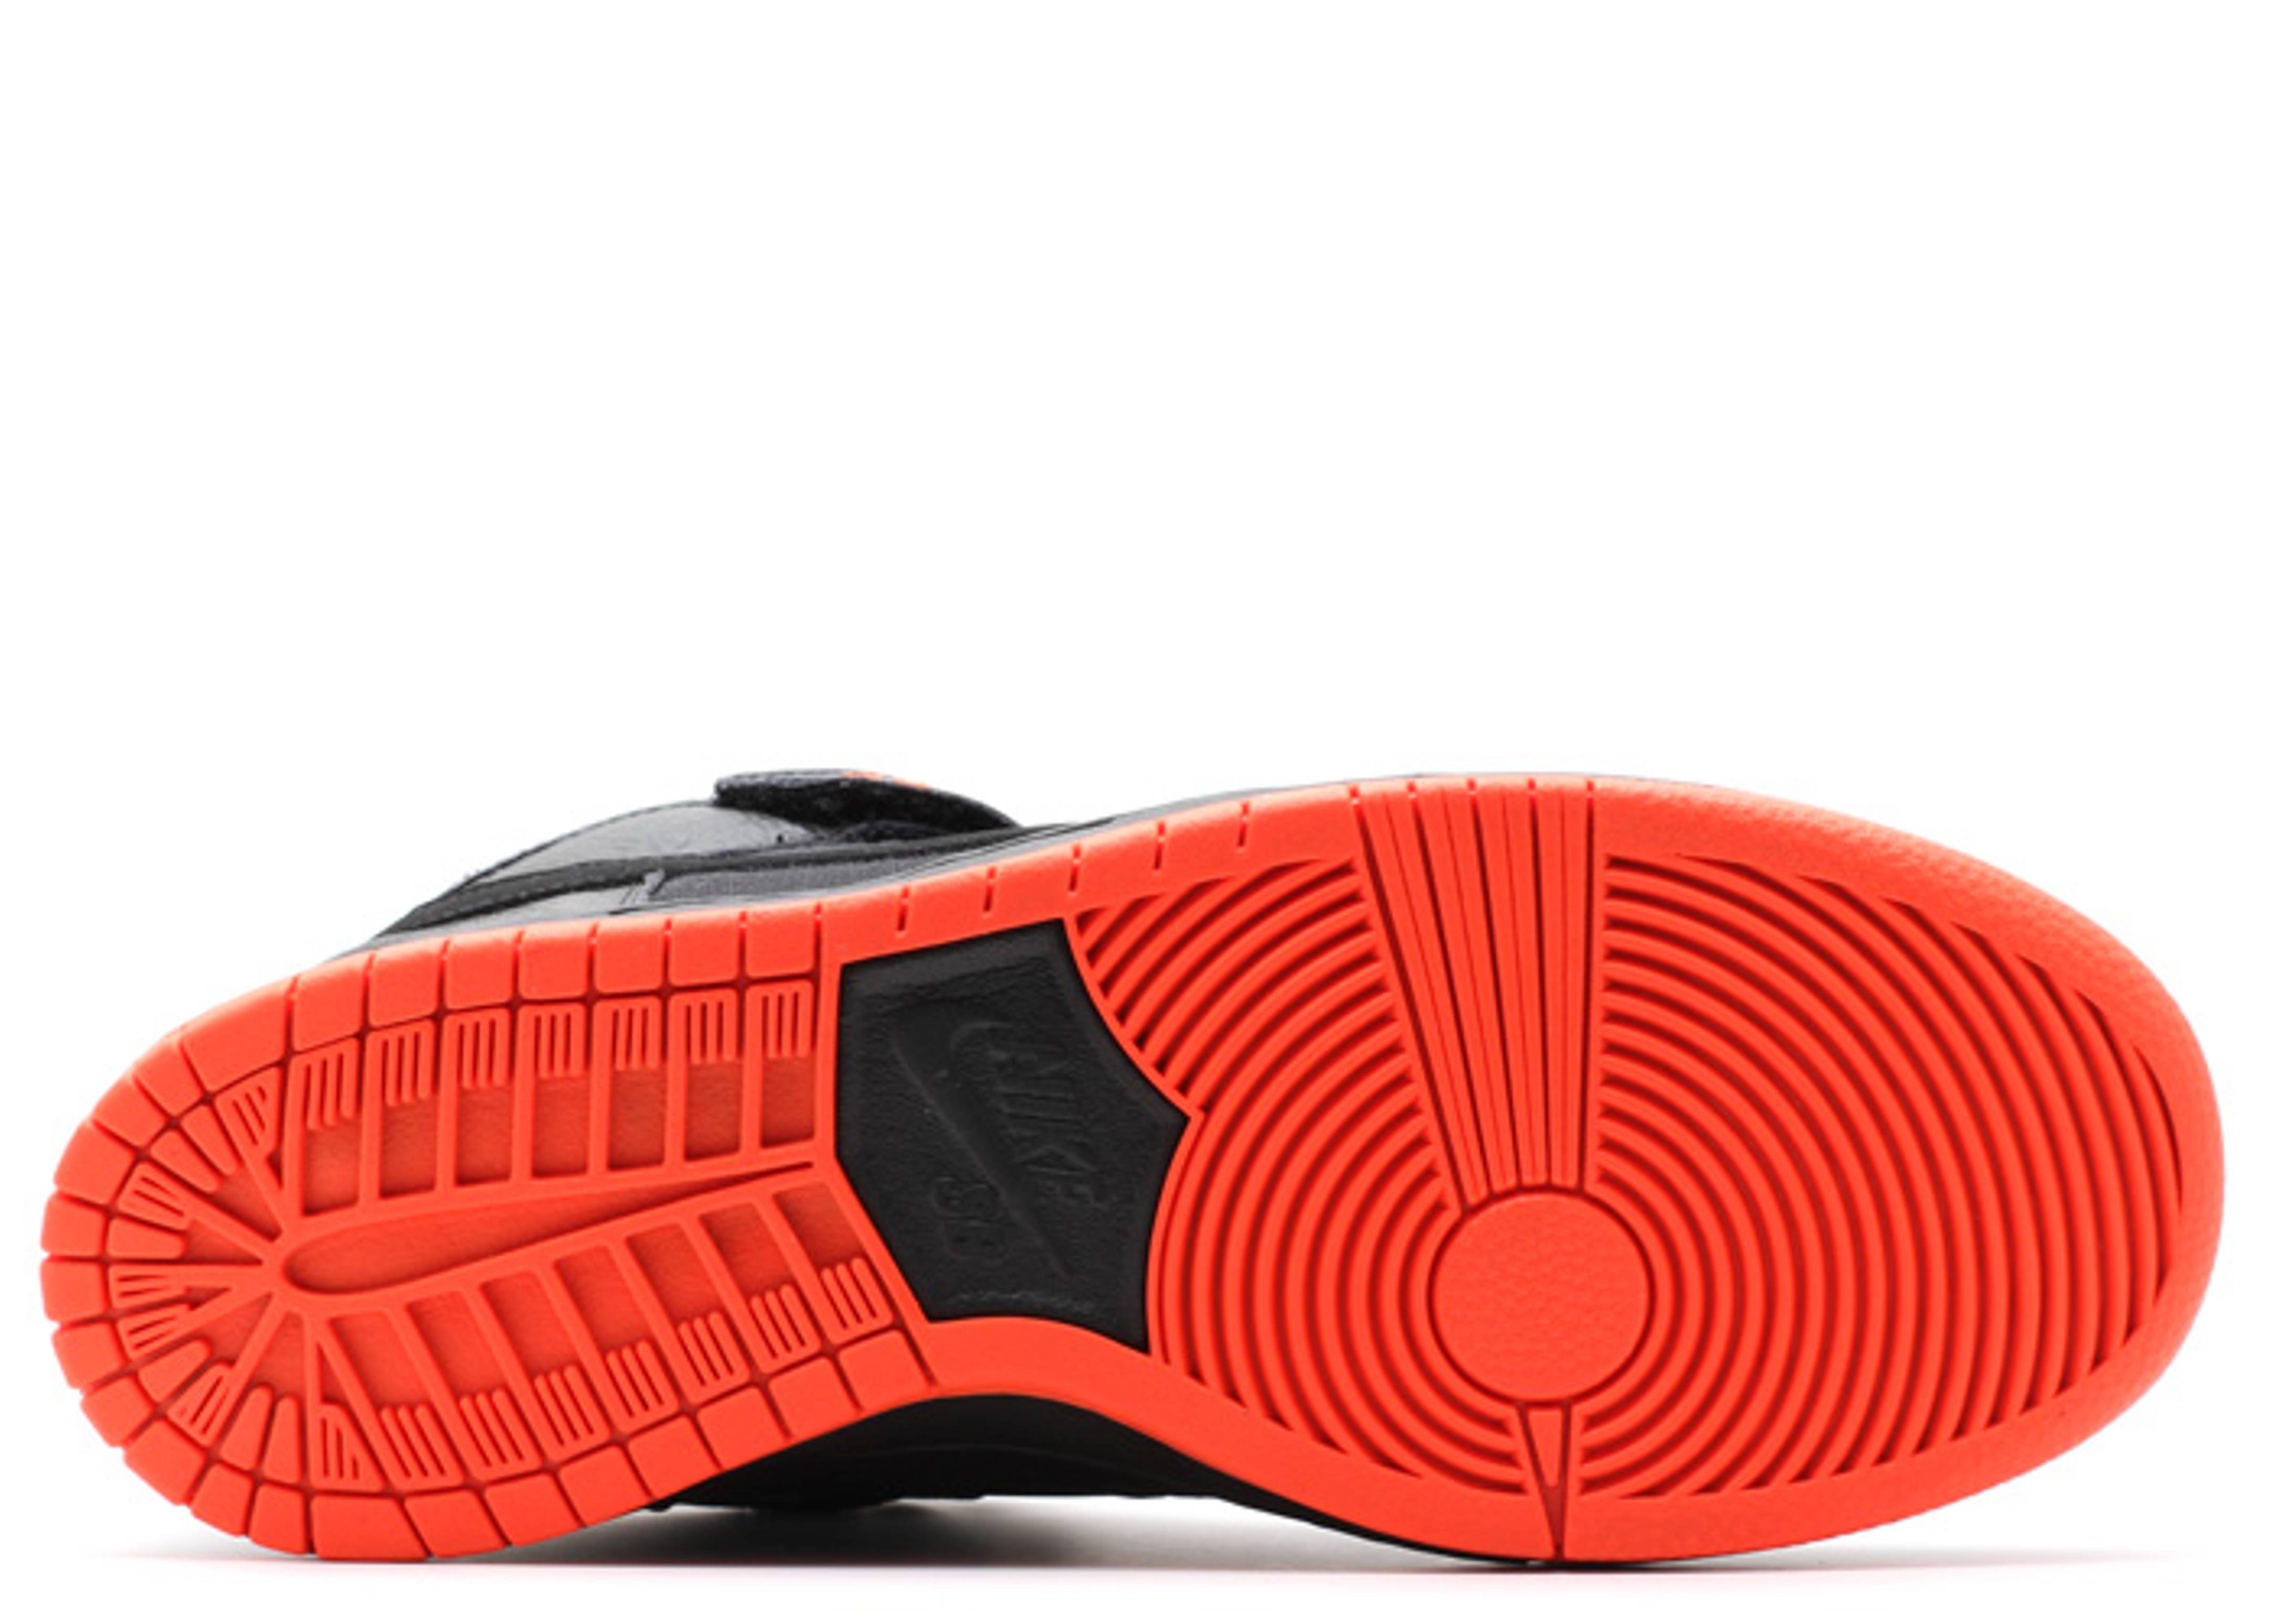 Nike Sb Dunk Mid Pro Halloween